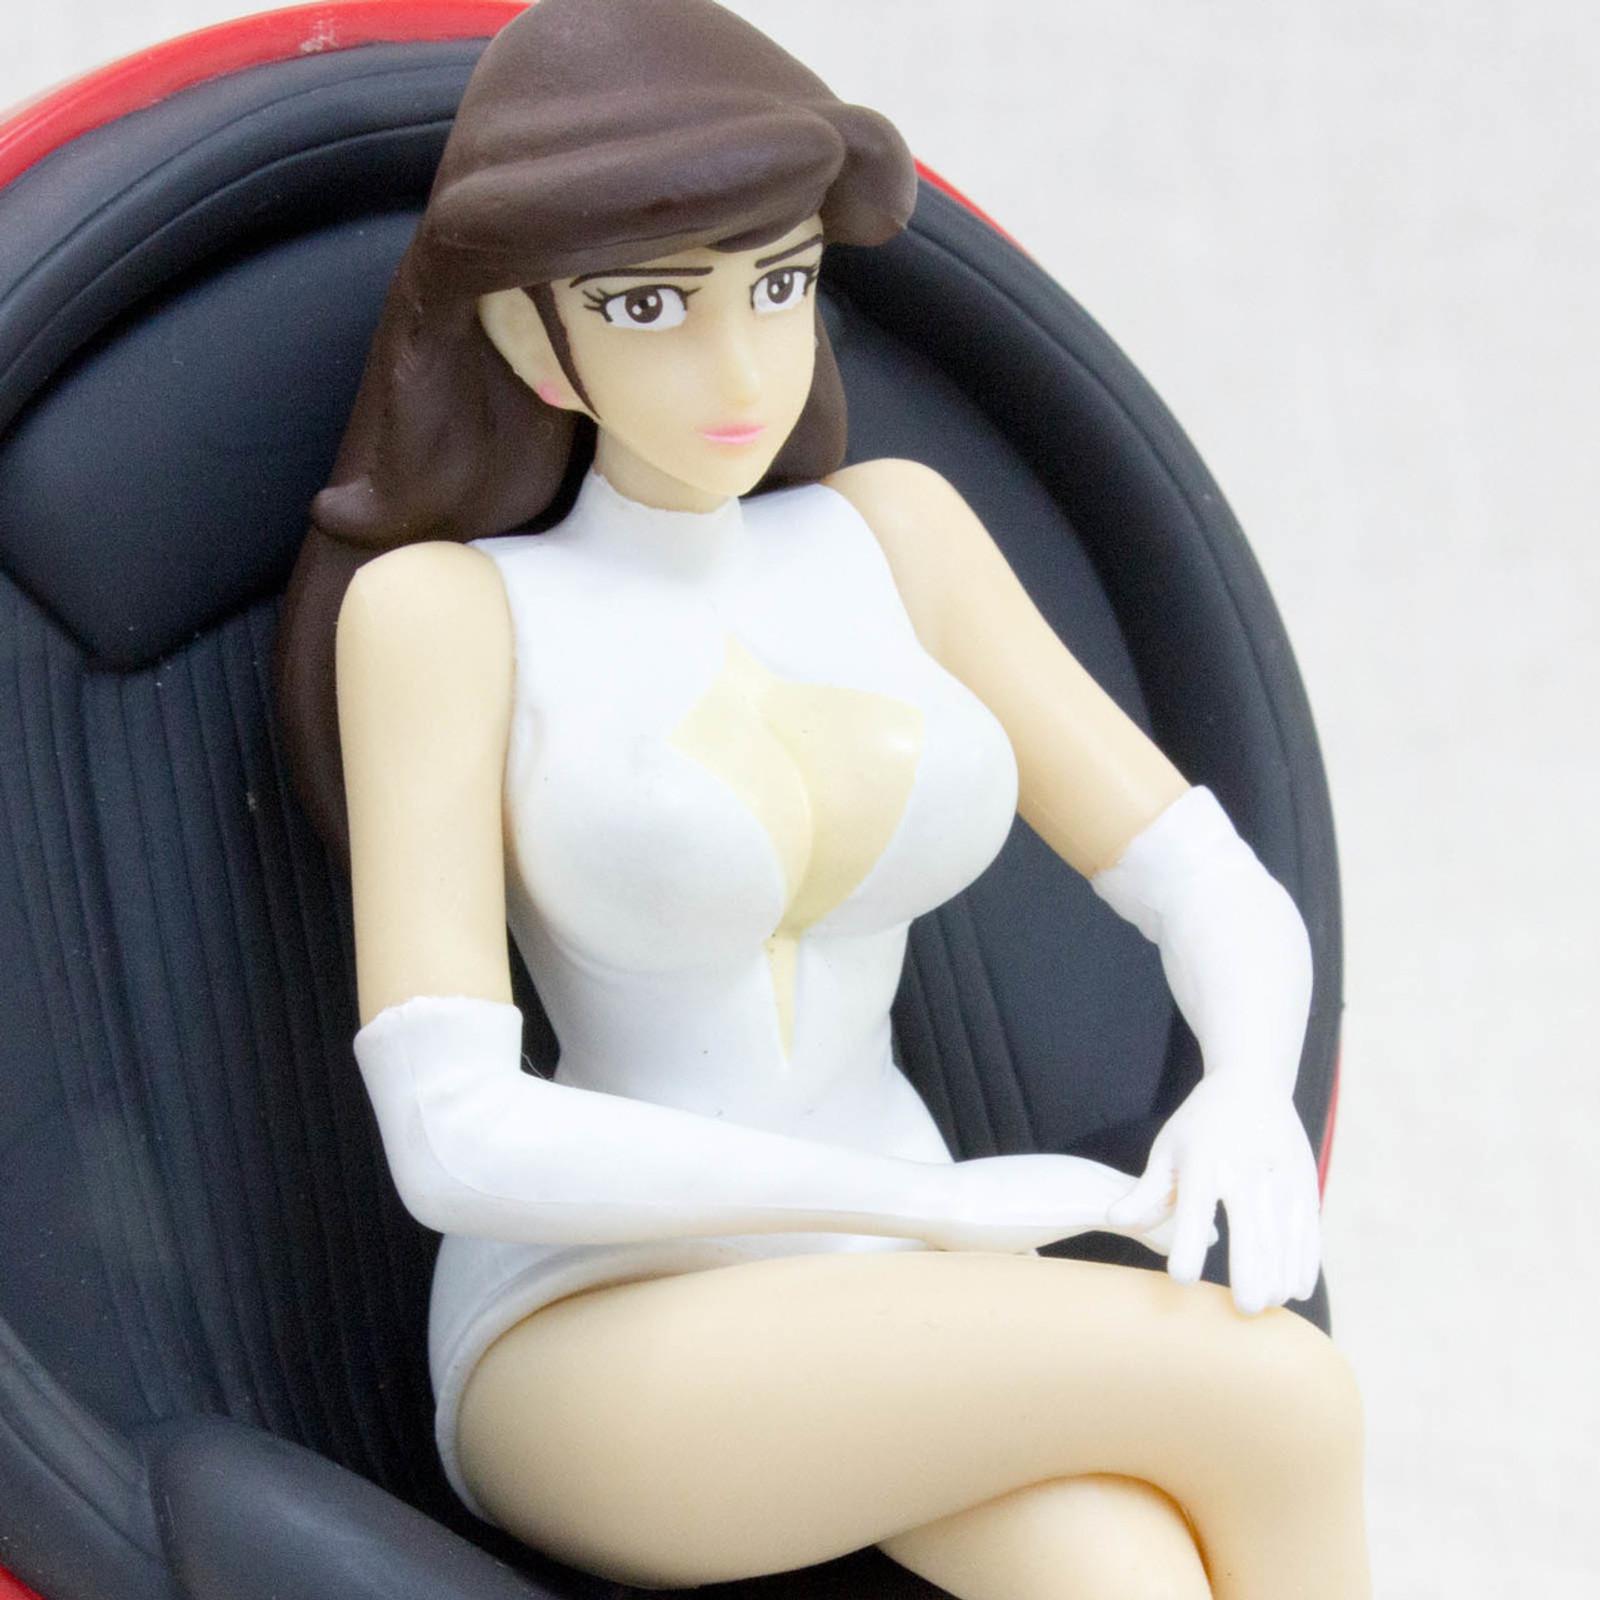 Lupin the Third (3rd) Fujiko Mine Figure On The Chair Banpresto JAPAN ANIME